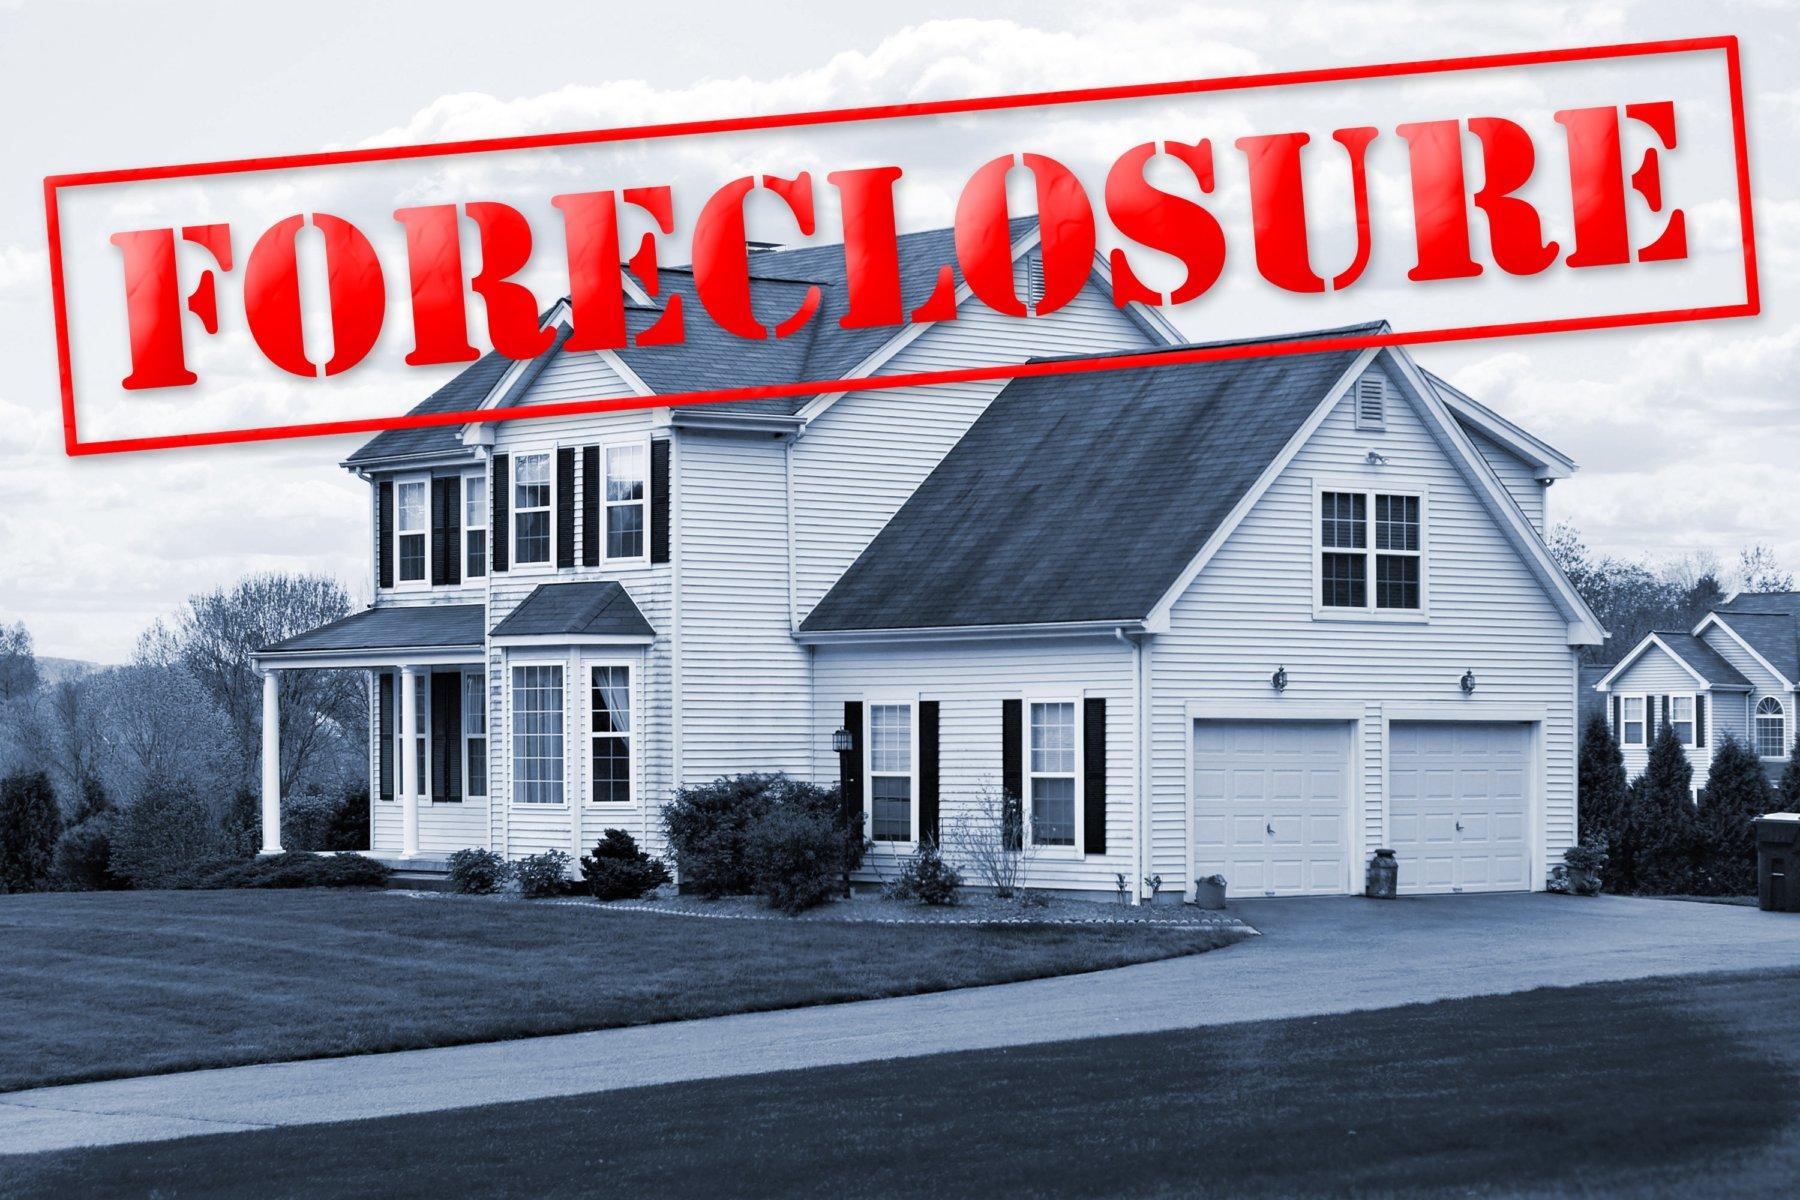 House Foreclosure Nj